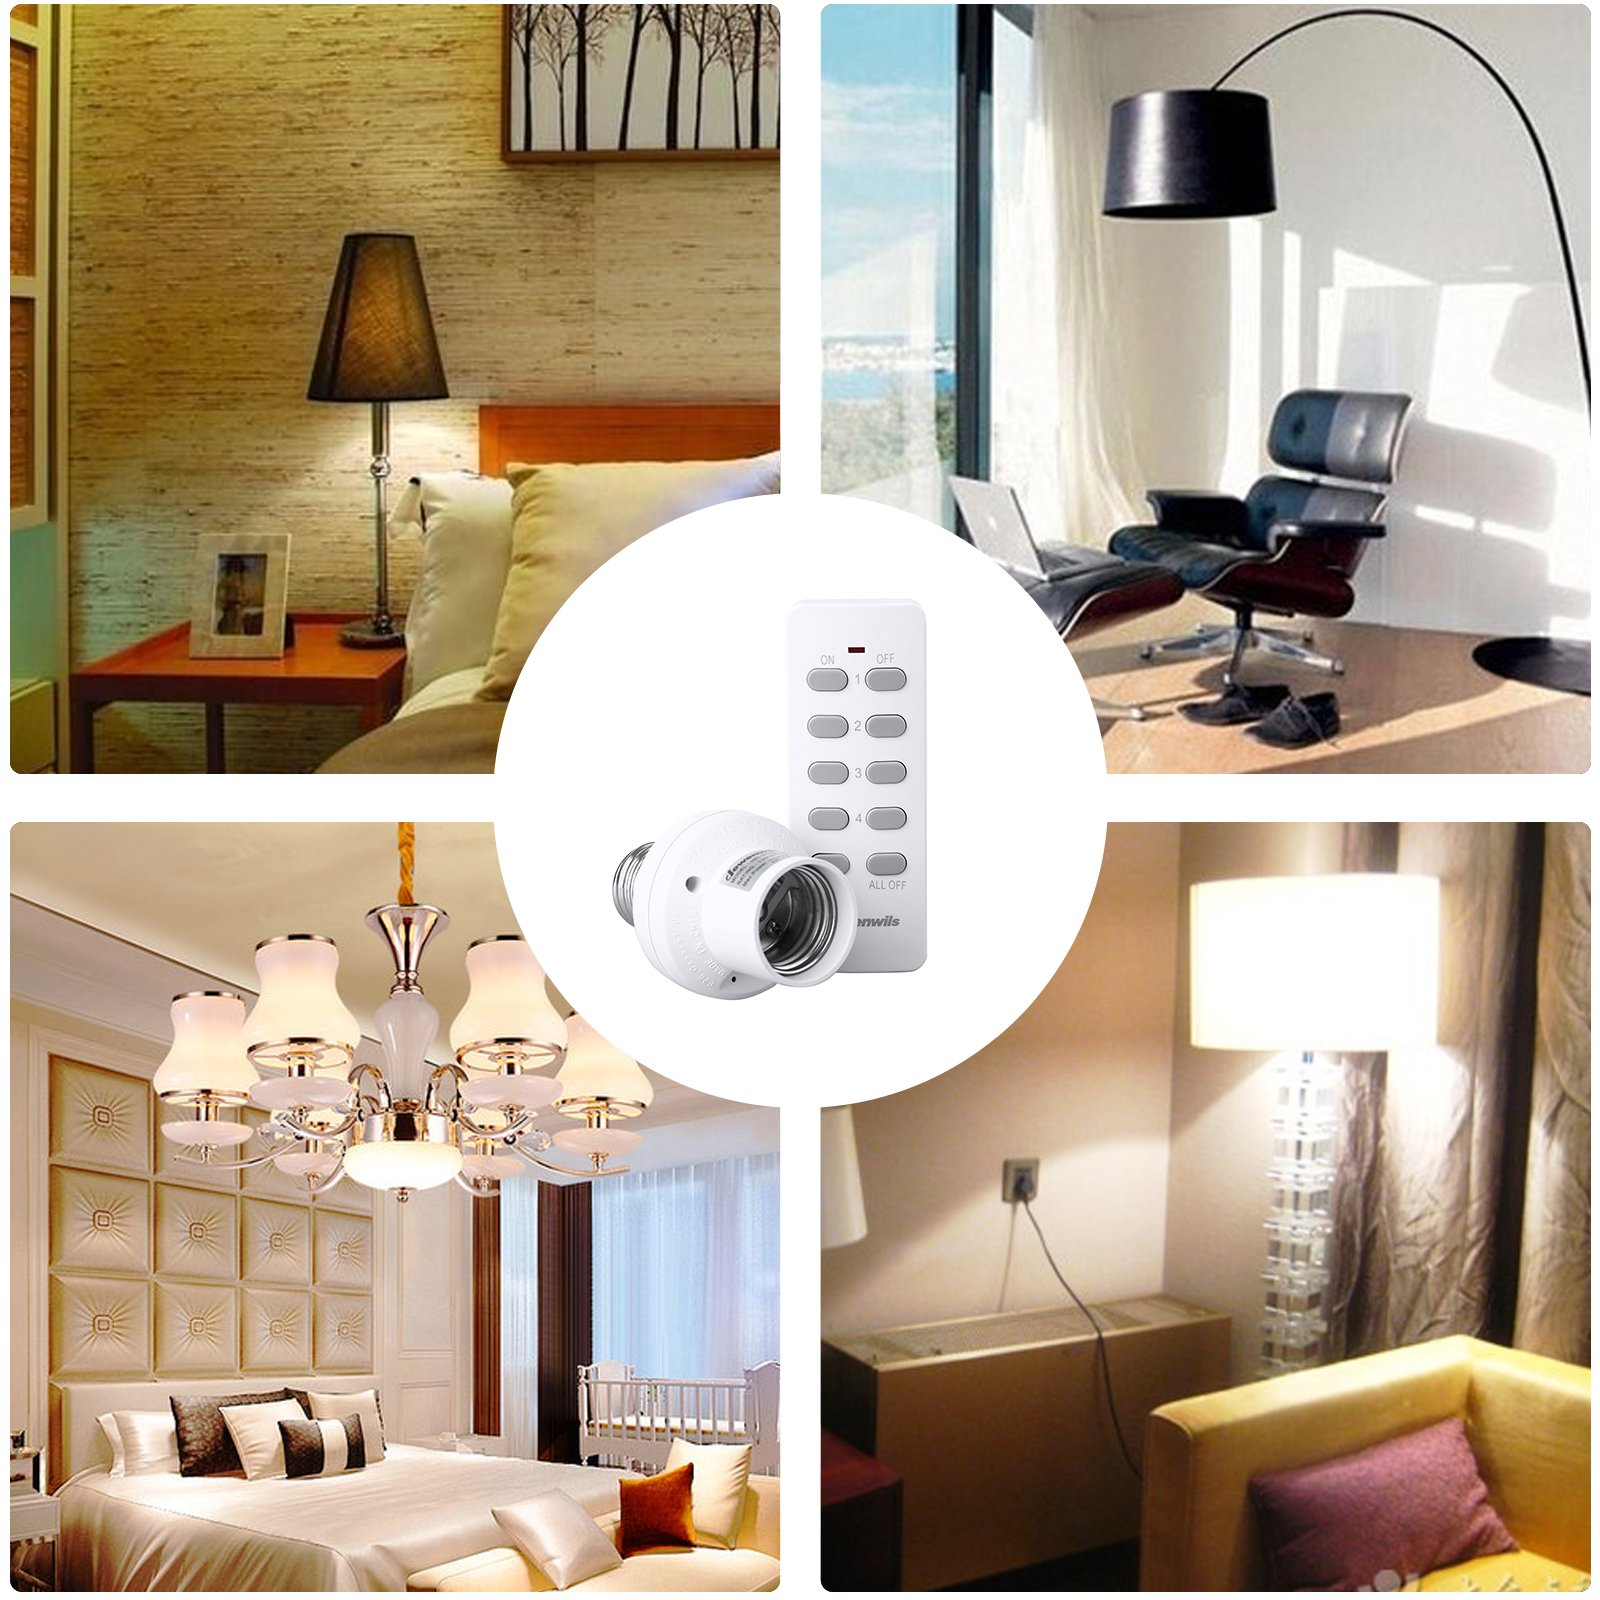 Dewenwils Remote Control Light Lamp Socket E26/E27 Bulb Base, Wireless Light Switch Kit, White (Programmable, 4 Sockets 2 Remotes, HRLSXXA Series) by DEWENWILS (Image #8)